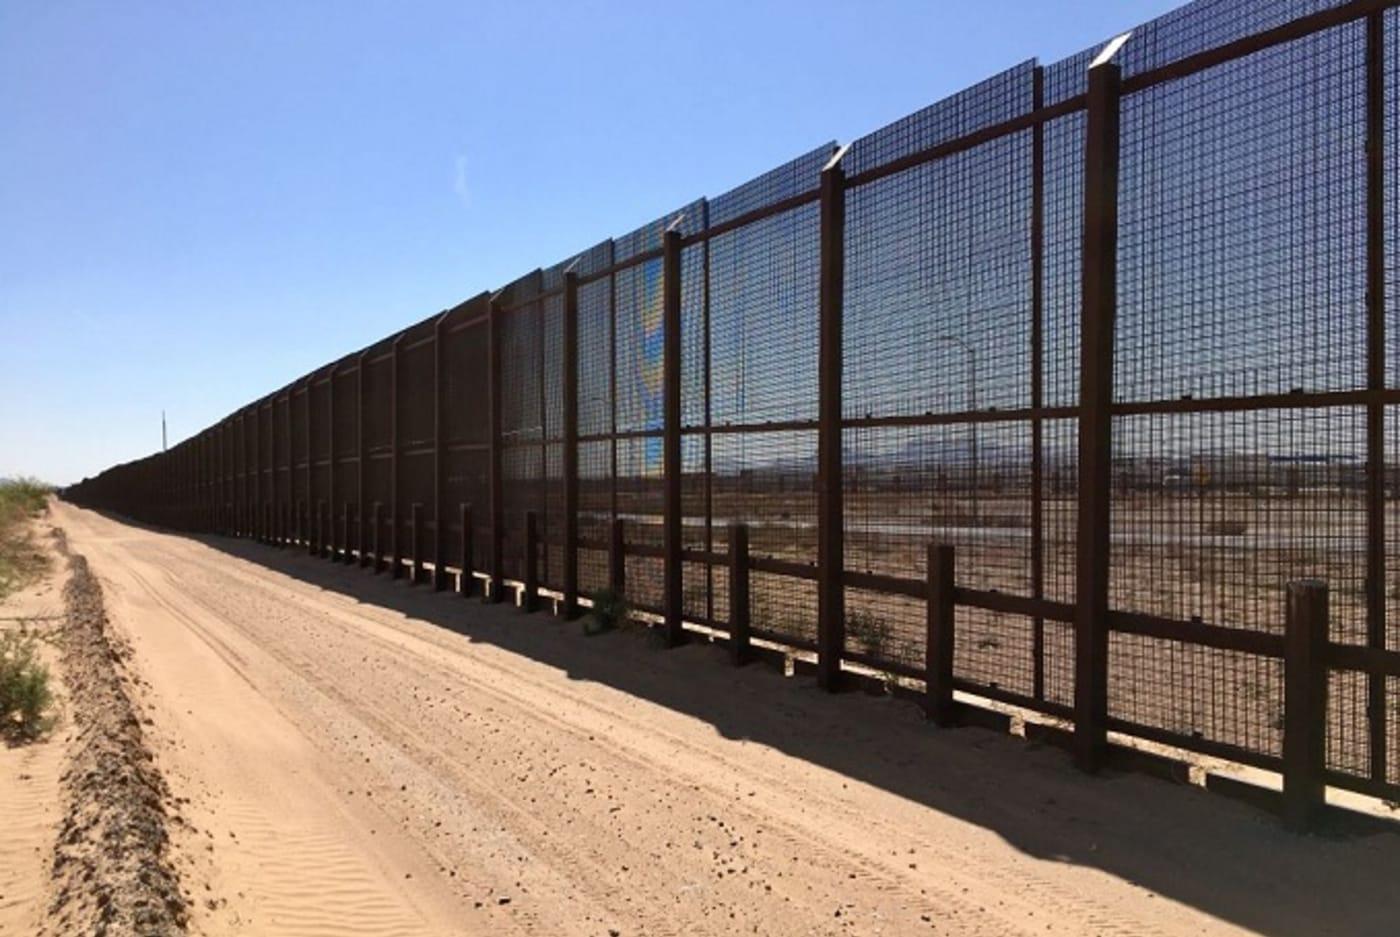 Mexico/U.S. border